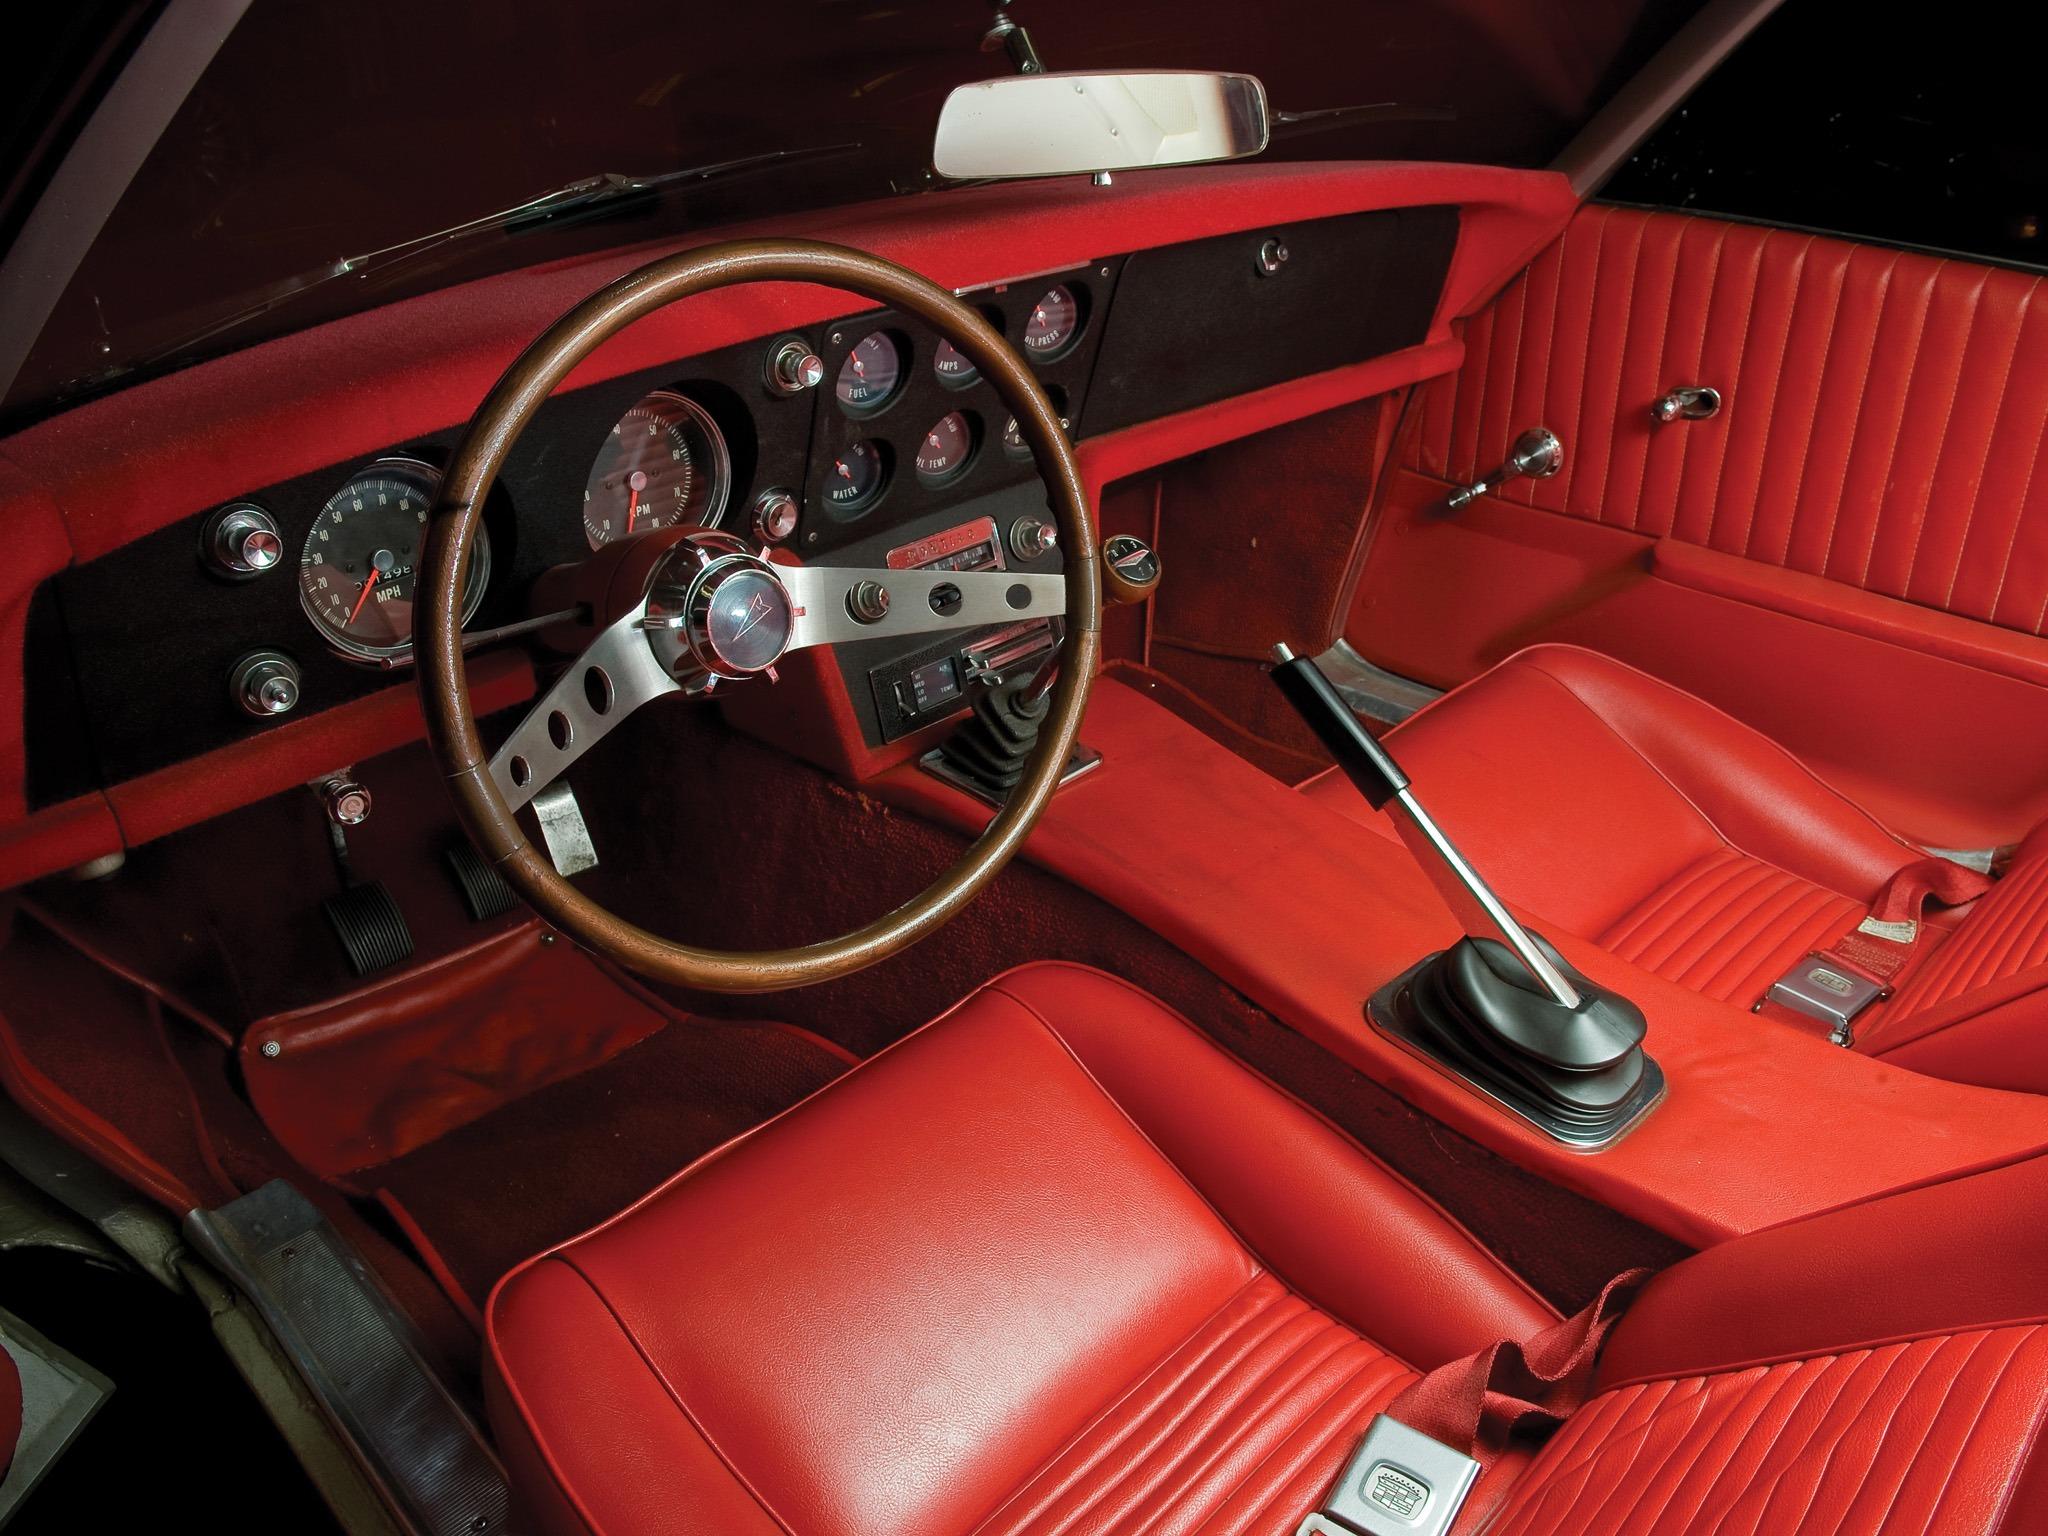 Pontiac Banshee Concept Car (1964) - Old Concept Cars